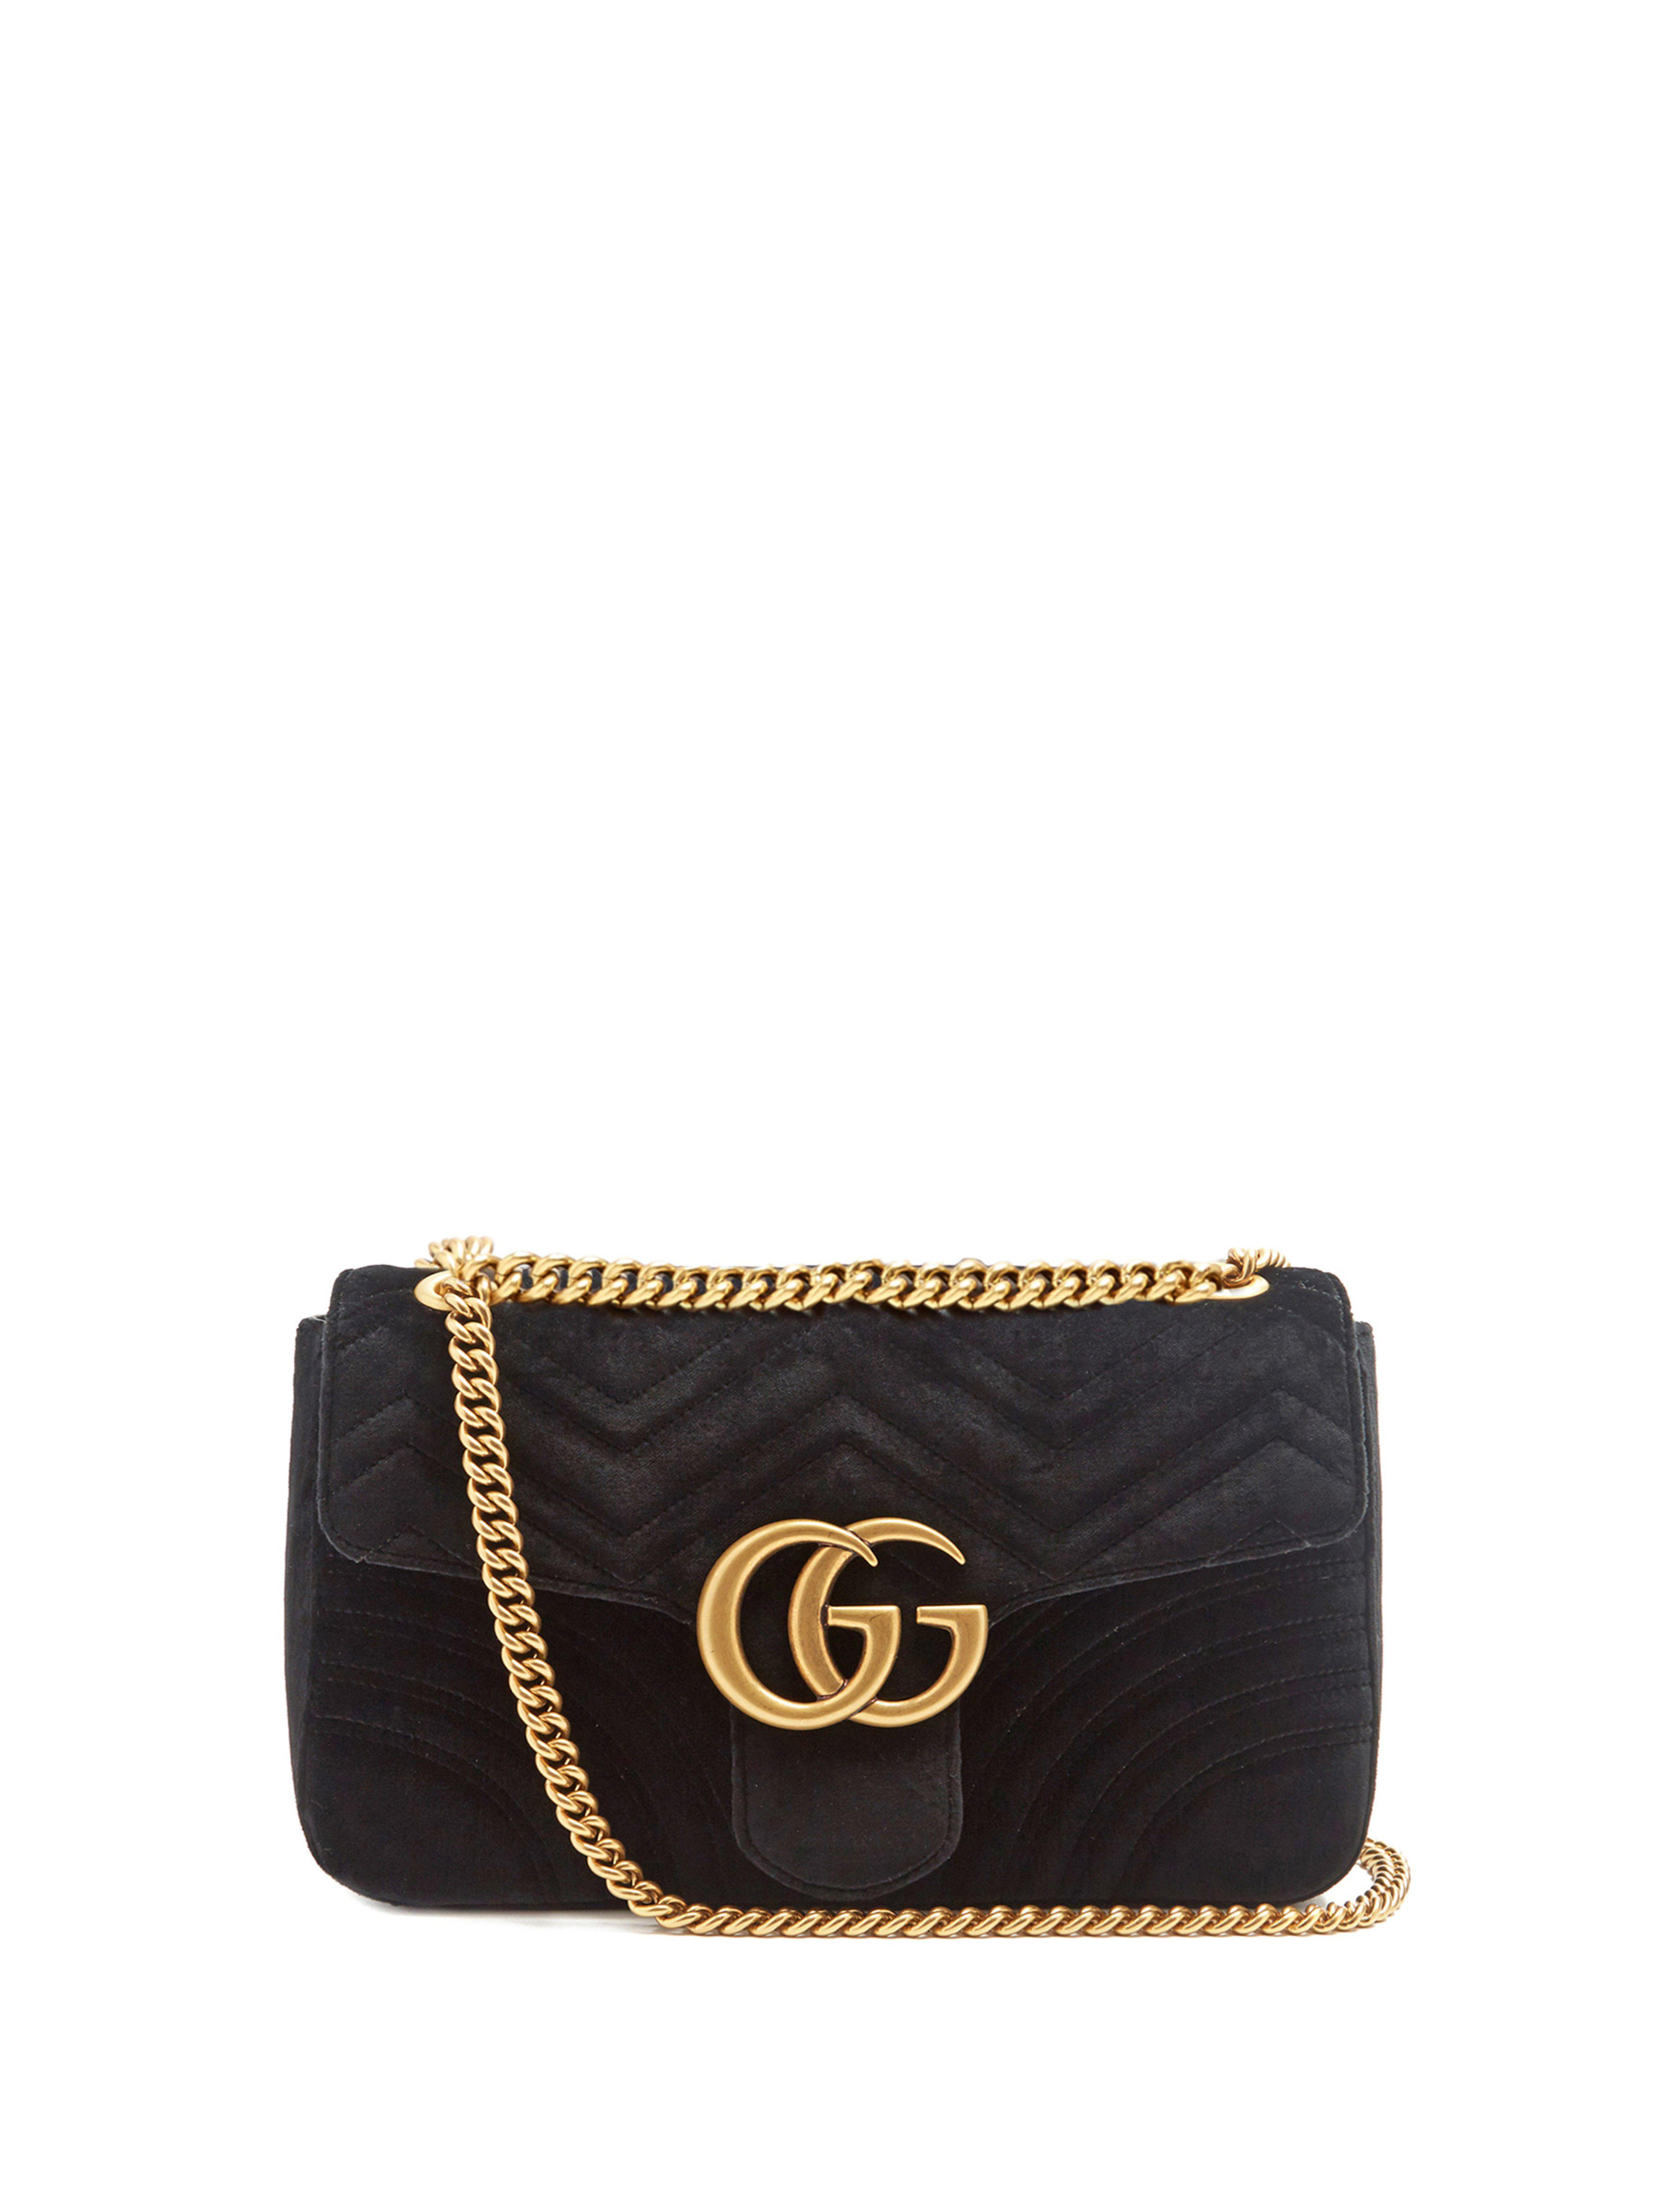 54cabe099d9 Gucci Gg Marmont Mini Velvet Quilted Shoulder Bag in Black - Lyst